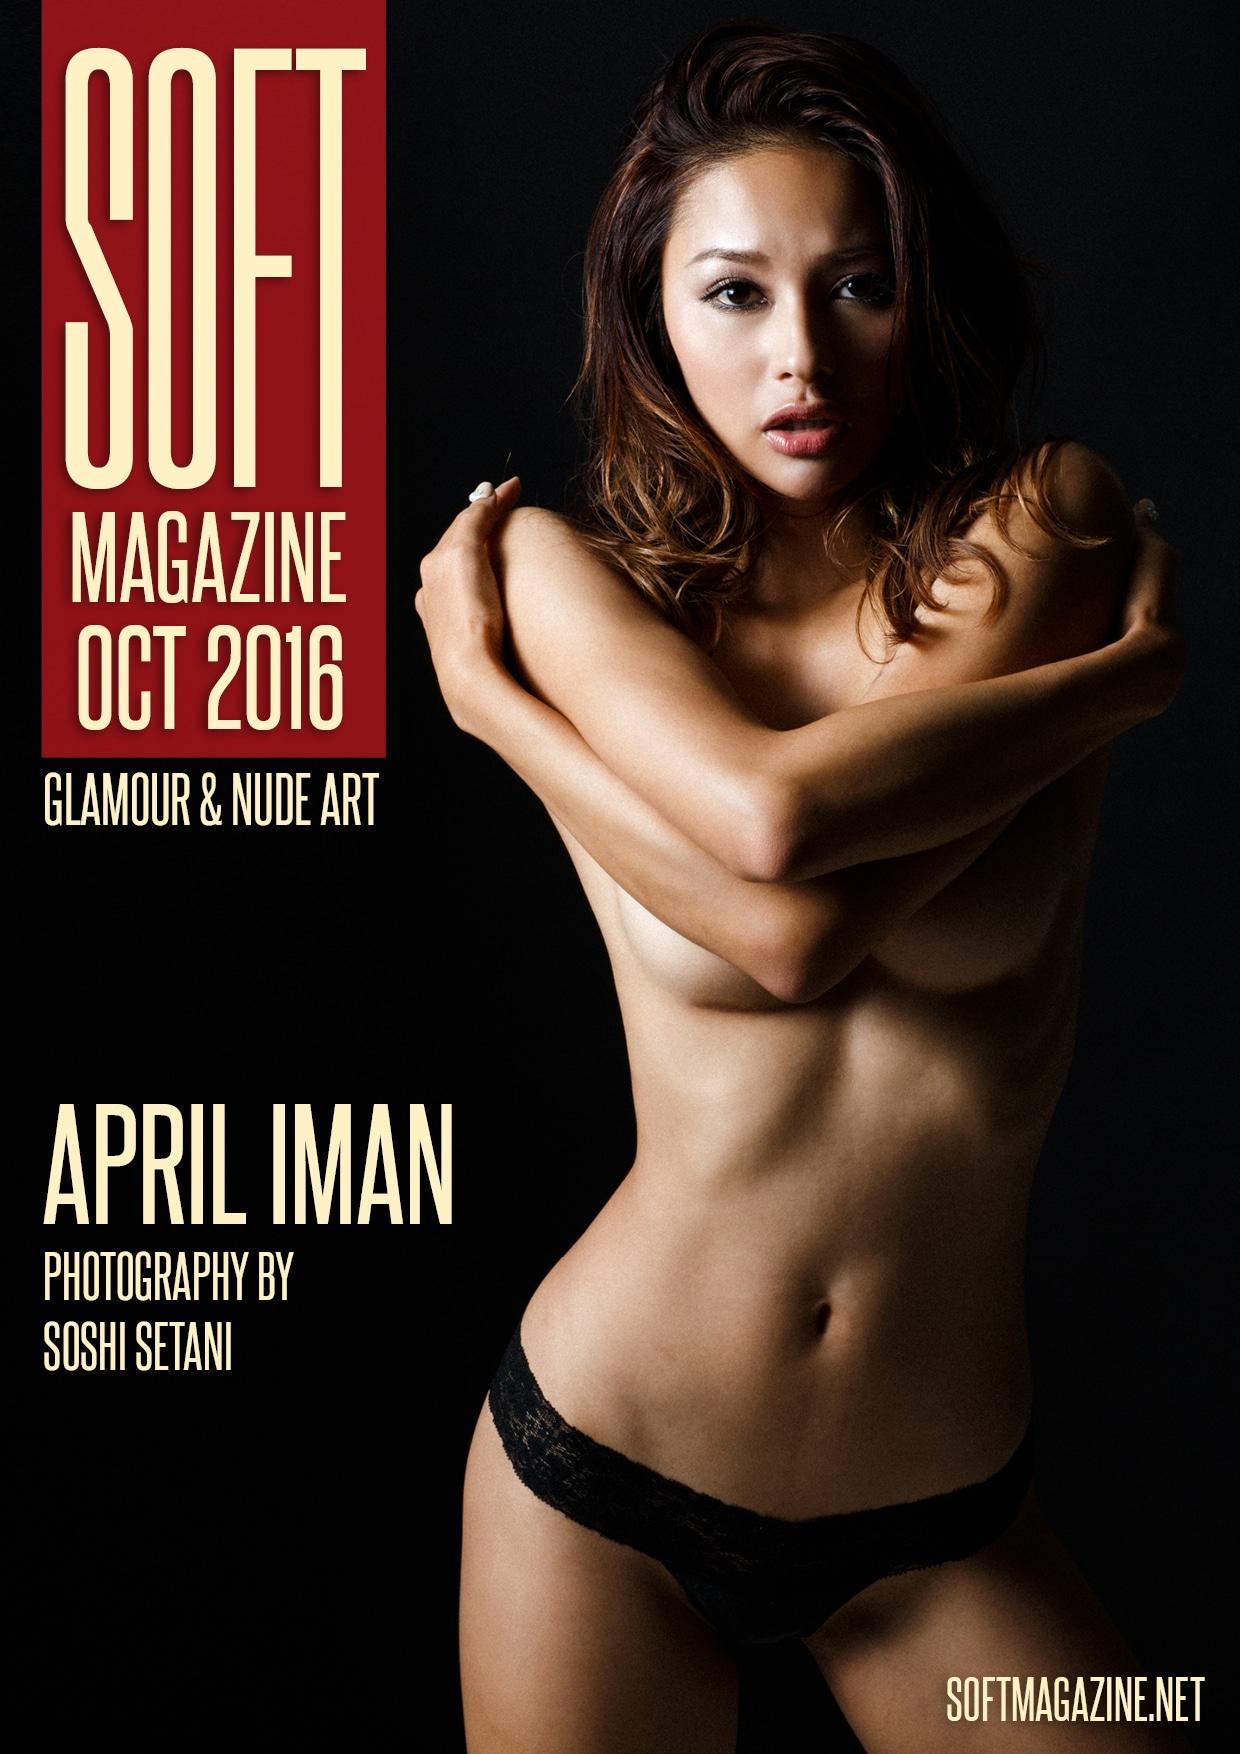 Soft Magazine – October 2016 – April Iman